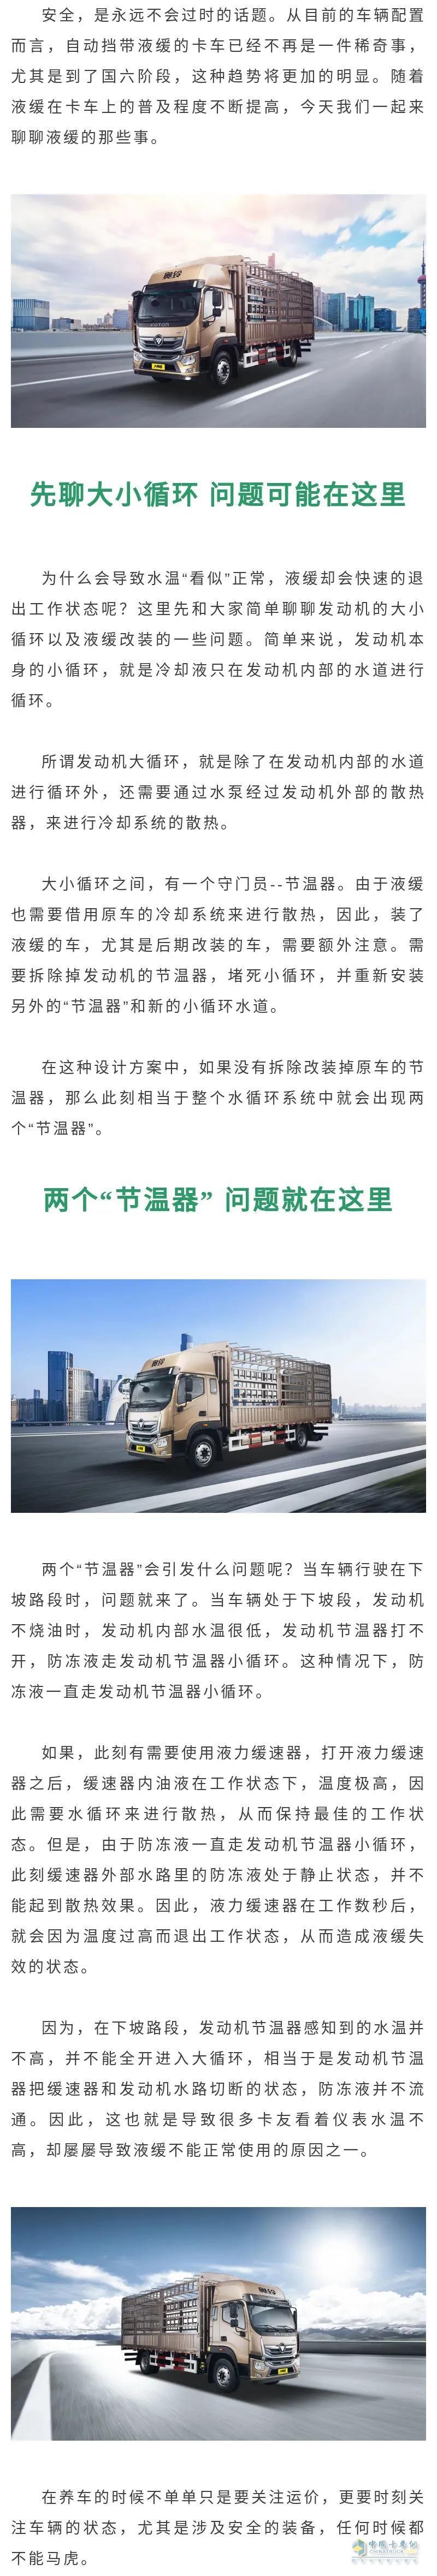 载货车 用车养车